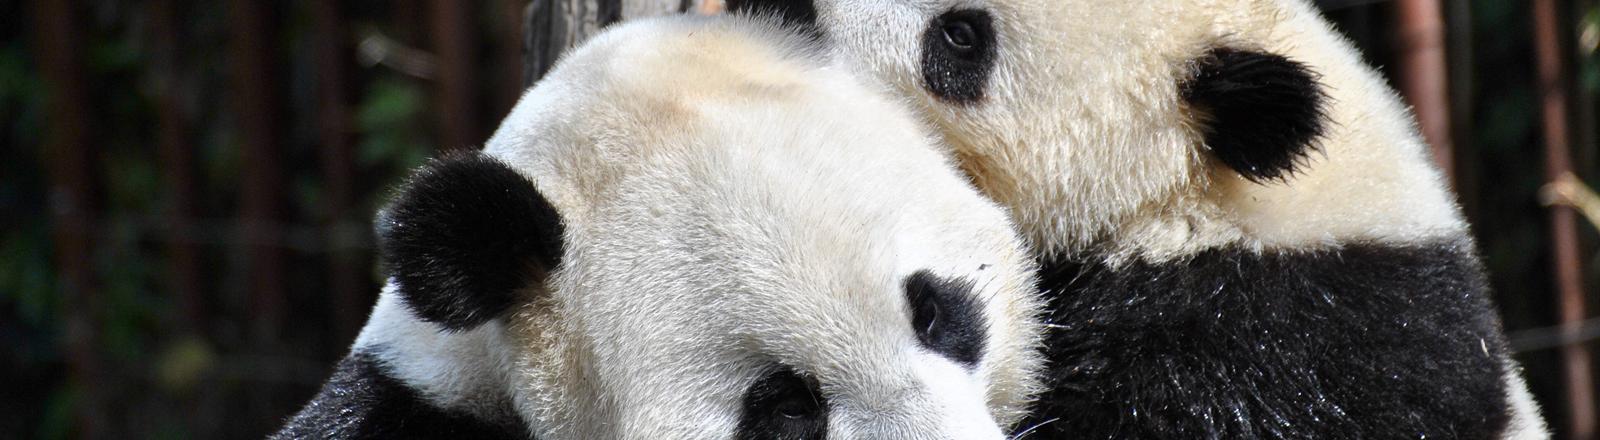 Zwei Pandas umarmen sich